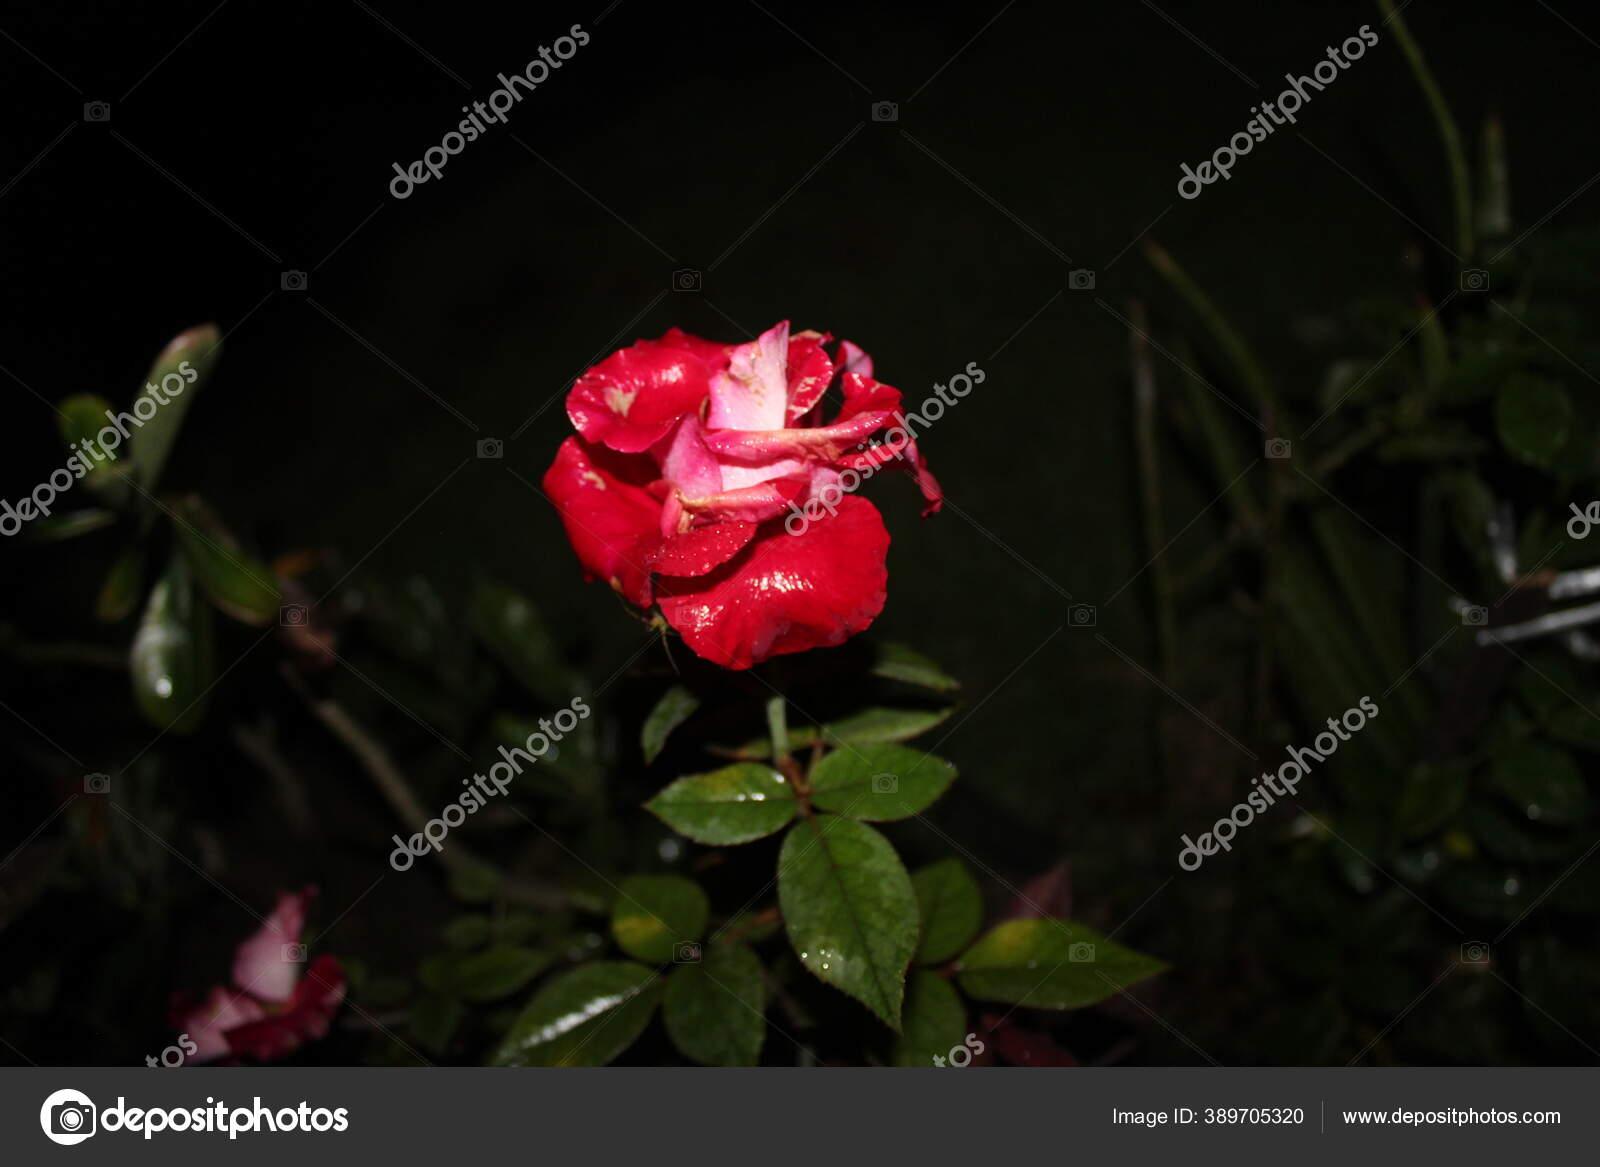 Mawar Merah Malam Hari Dan Hujan Turun Warna Yang Indah Stok Foto C Ayska17 389705320